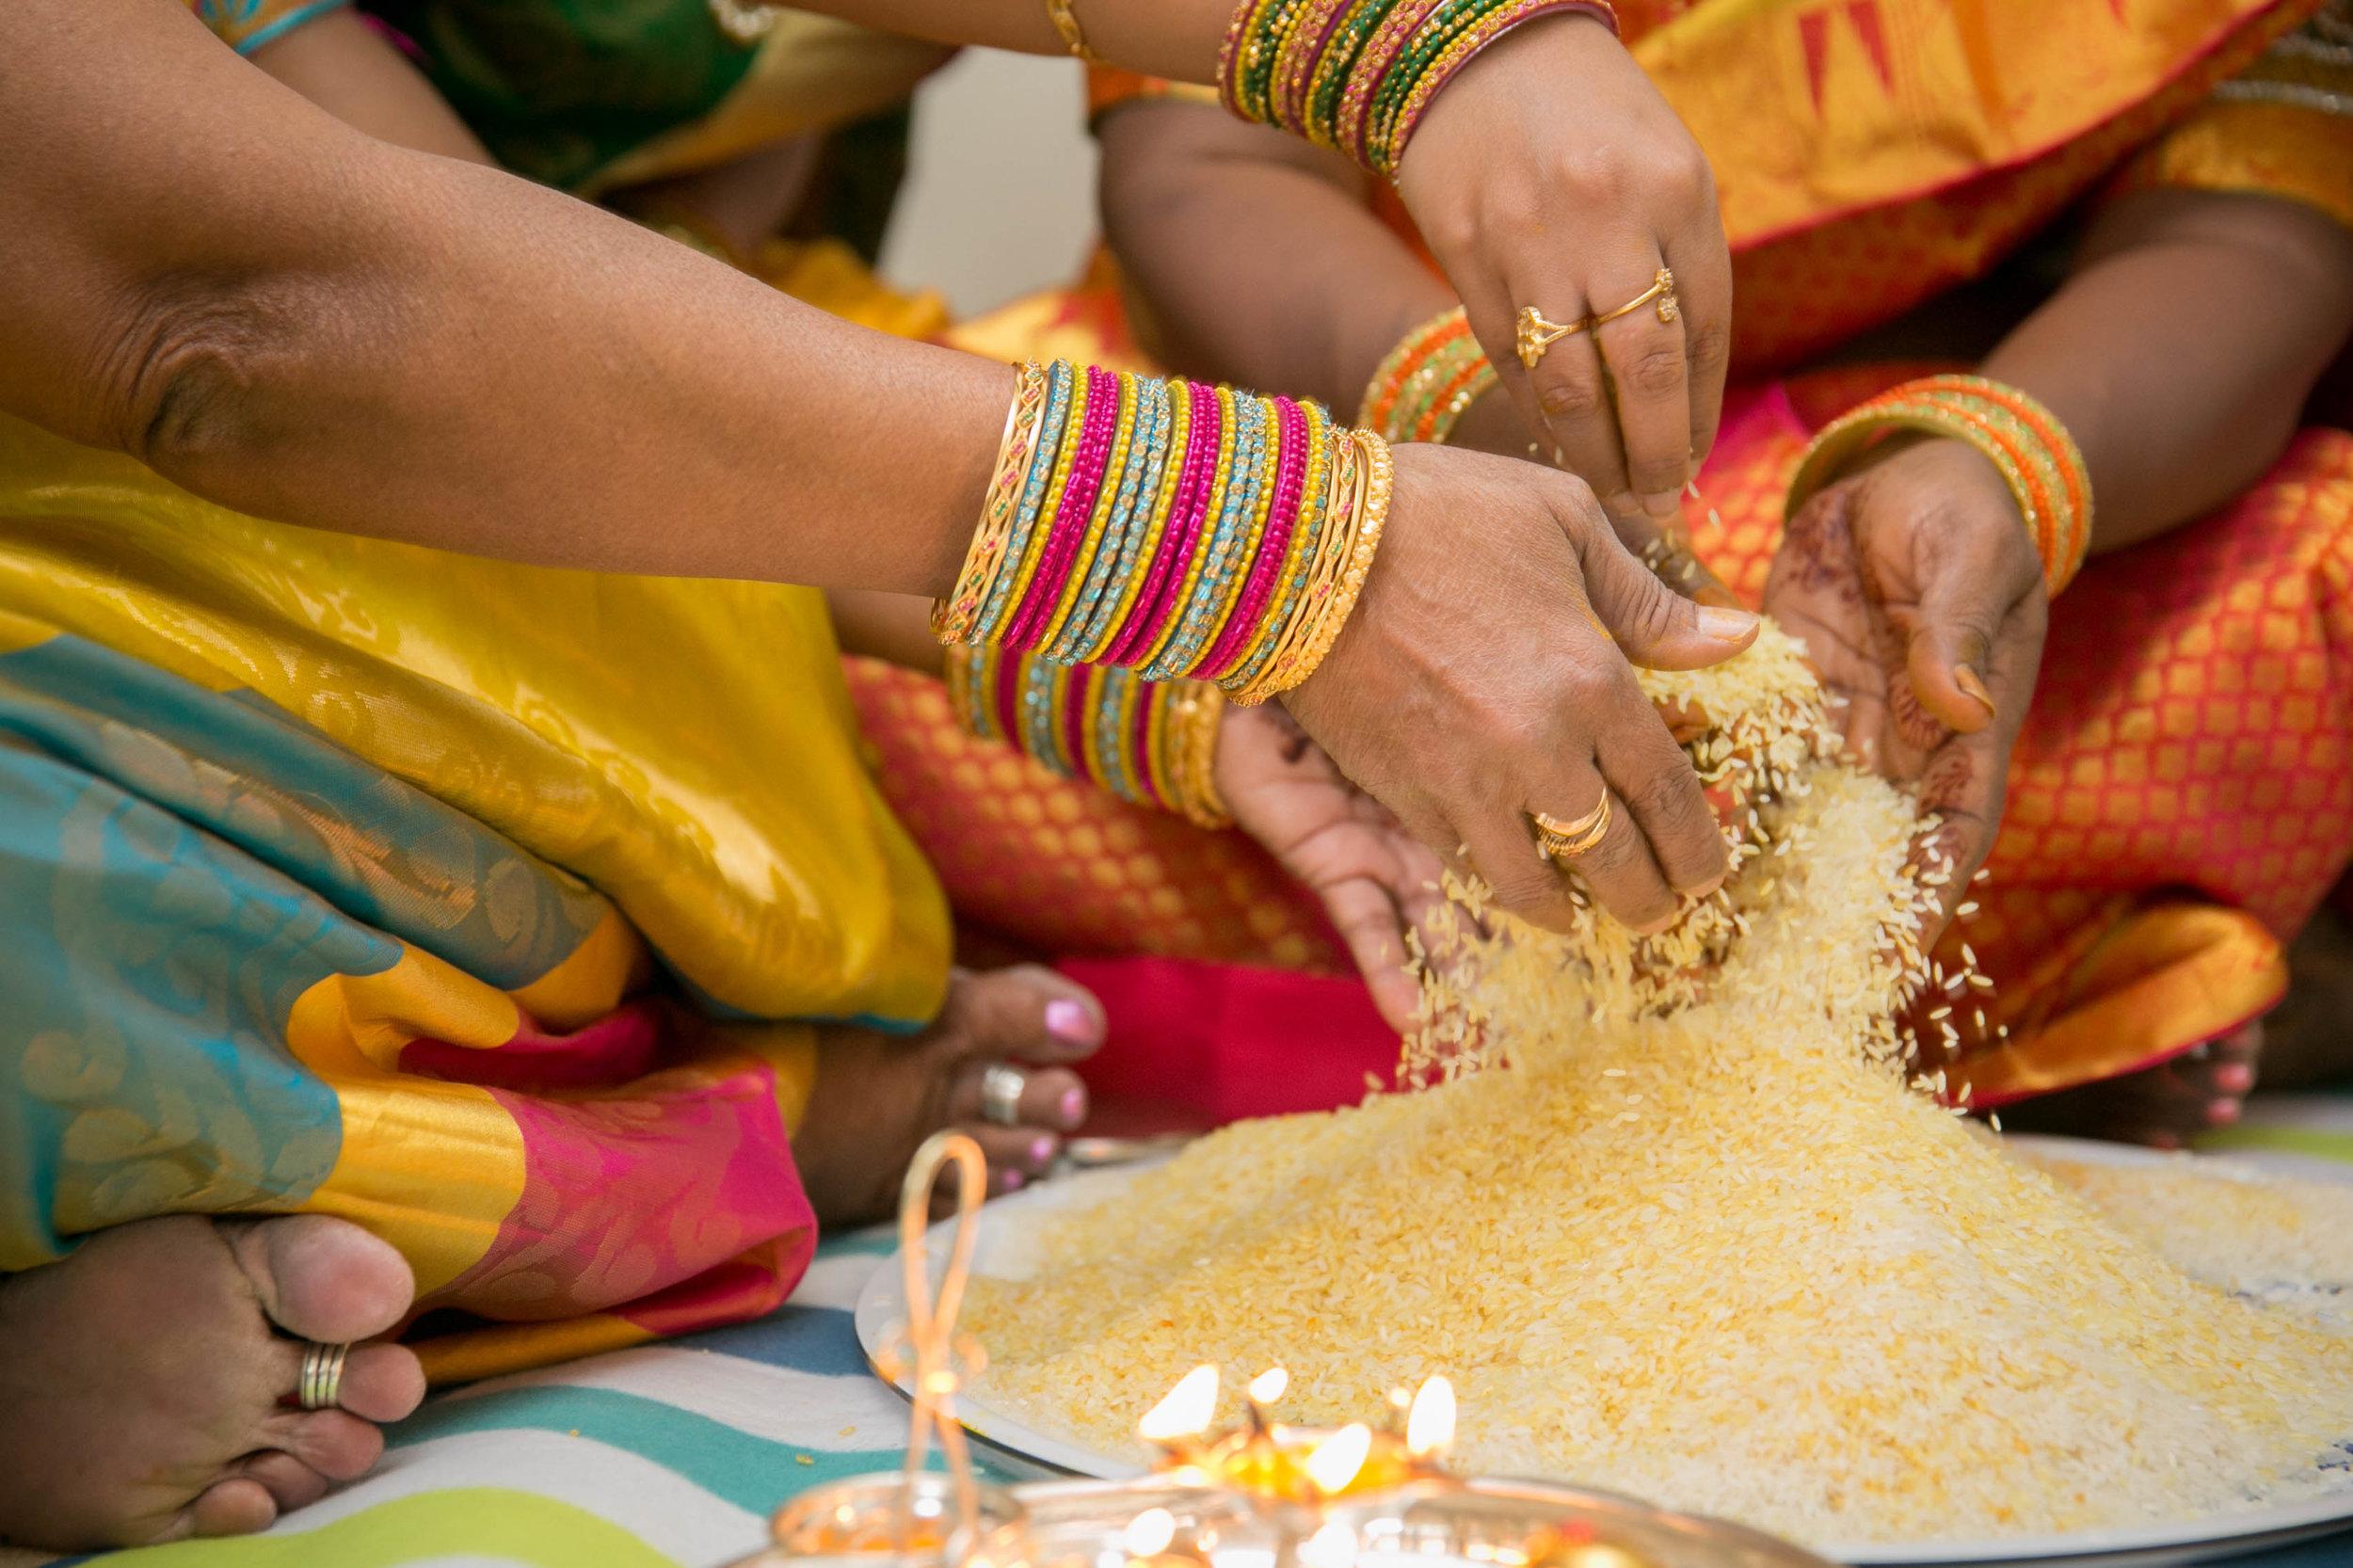 premier-banquetting-london-Hindu-asian-wedding-photographer-natalia-smith-photography-2.jpg